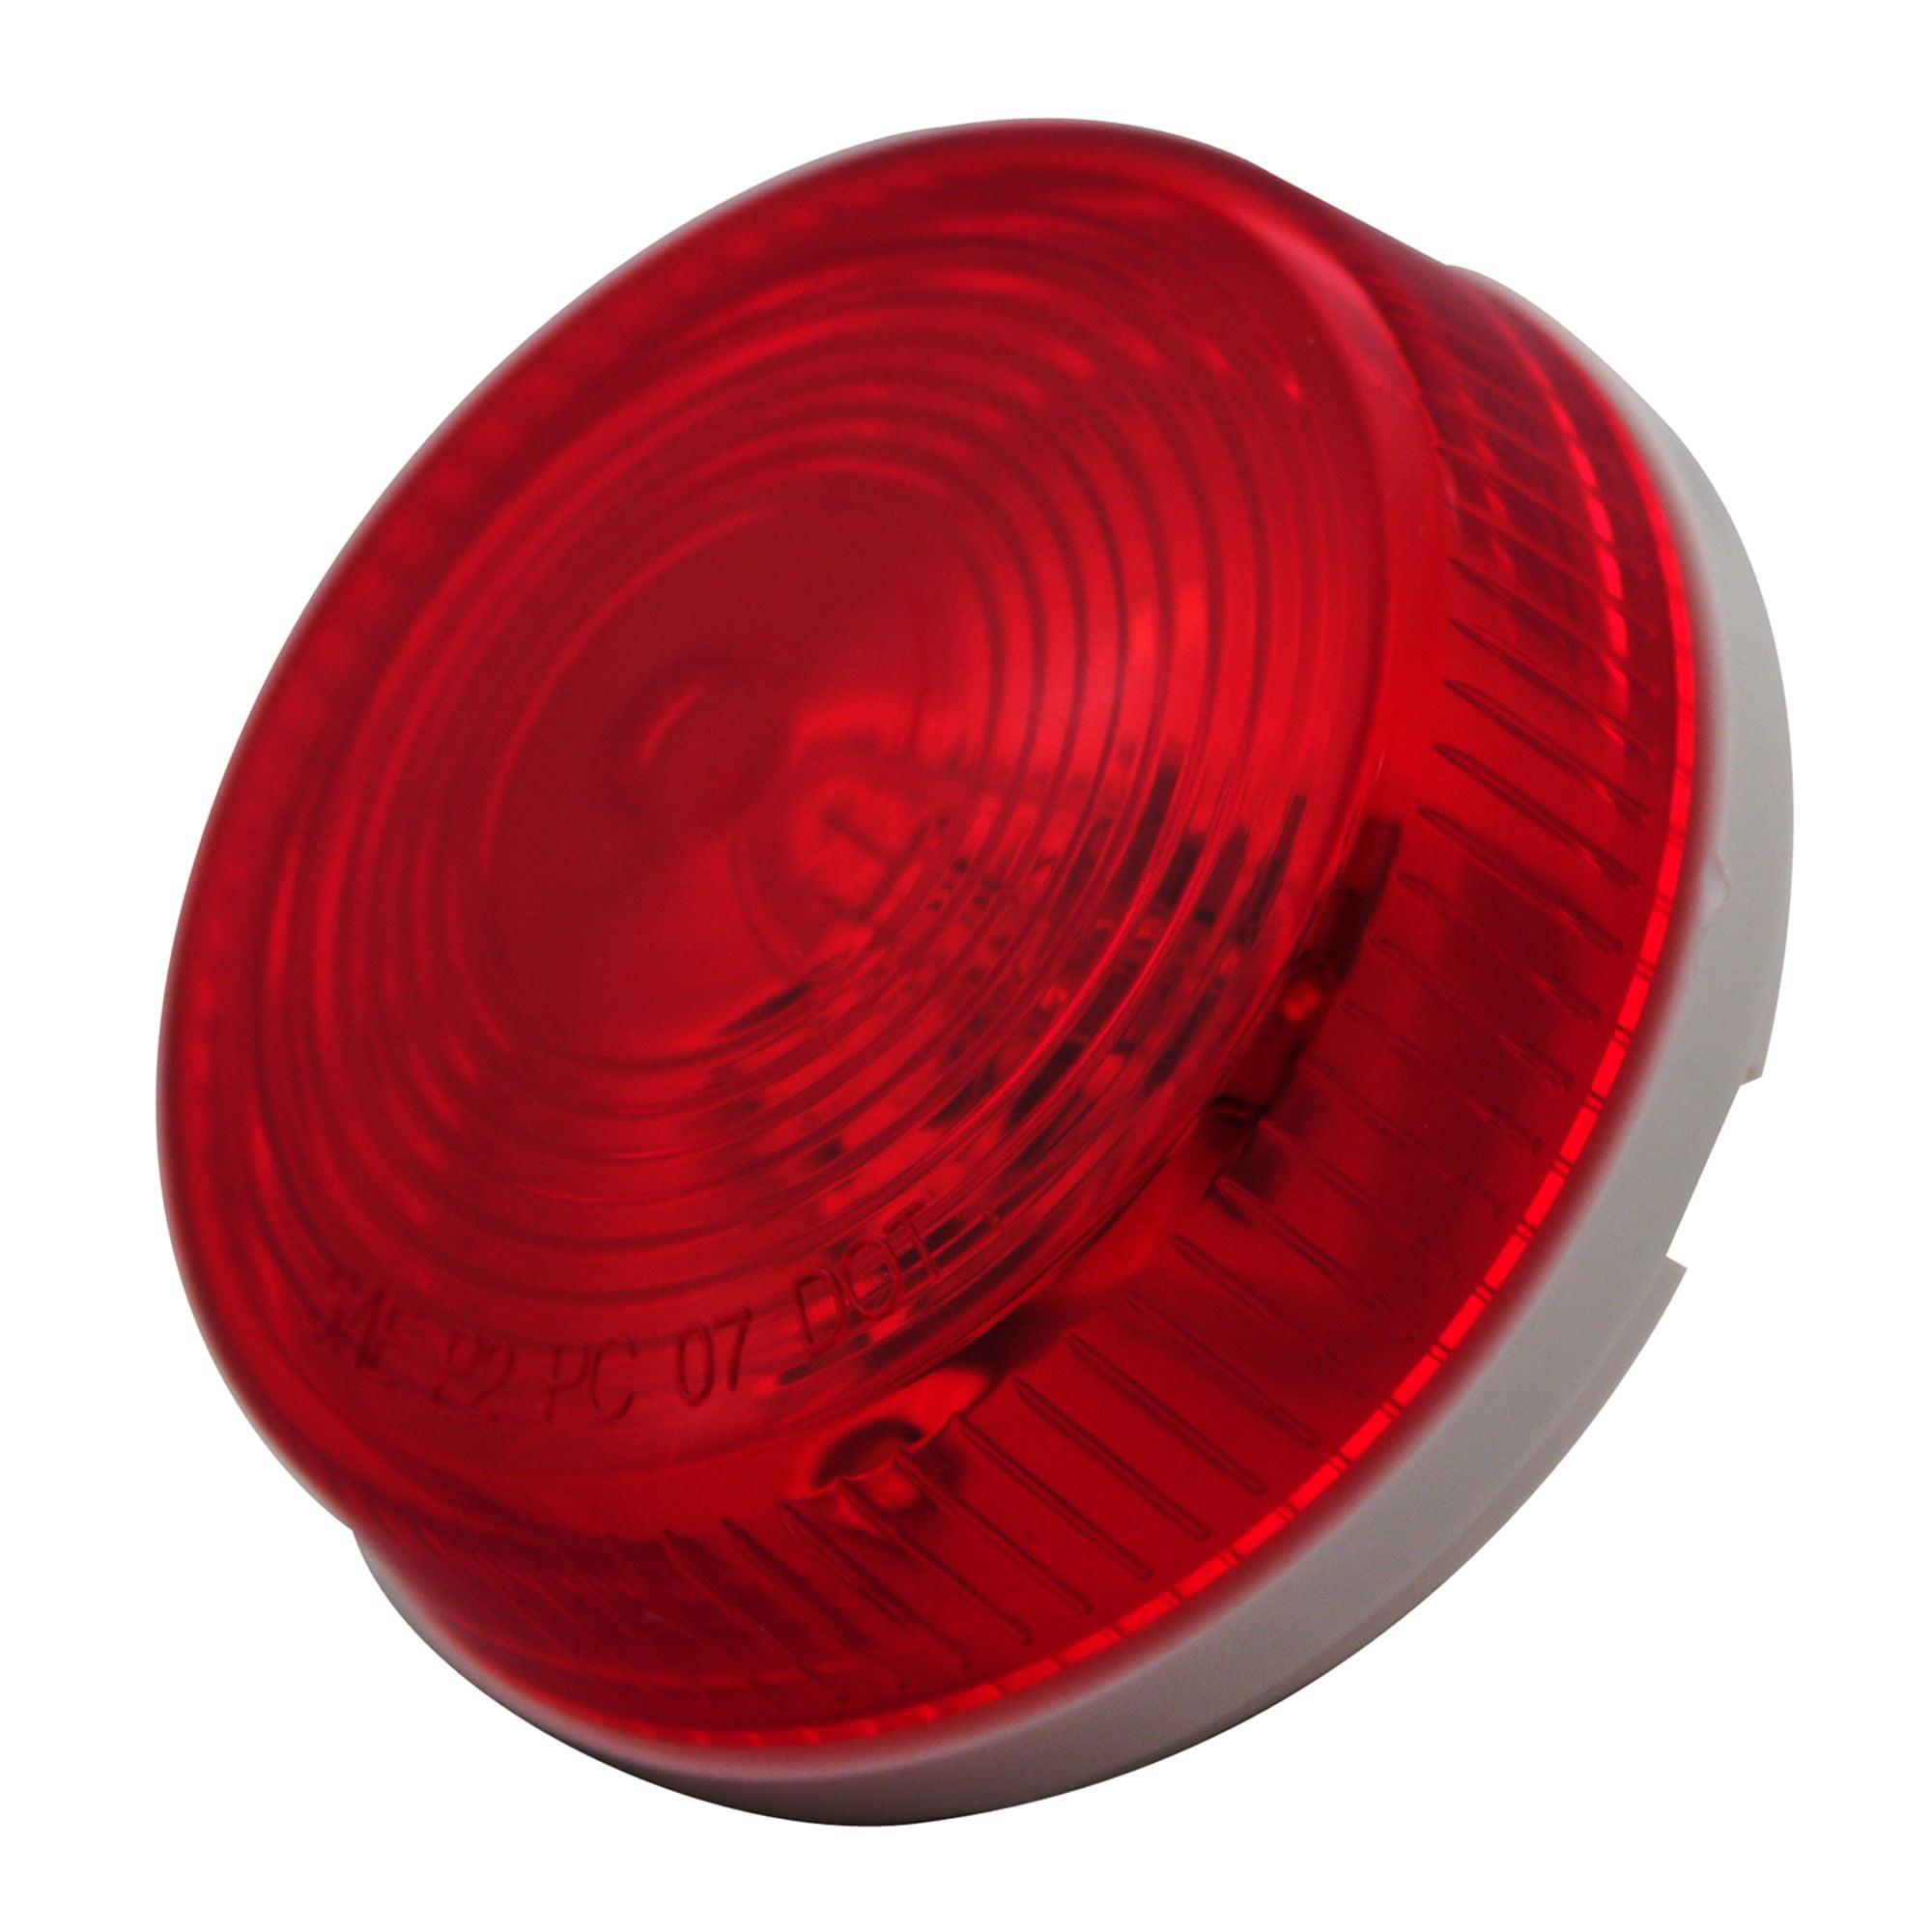 Pilot Automotive NV-5073R 12 Volt 2.5 inch Round Clearance Light-Red Size: 2-1/2 x 1-1/16